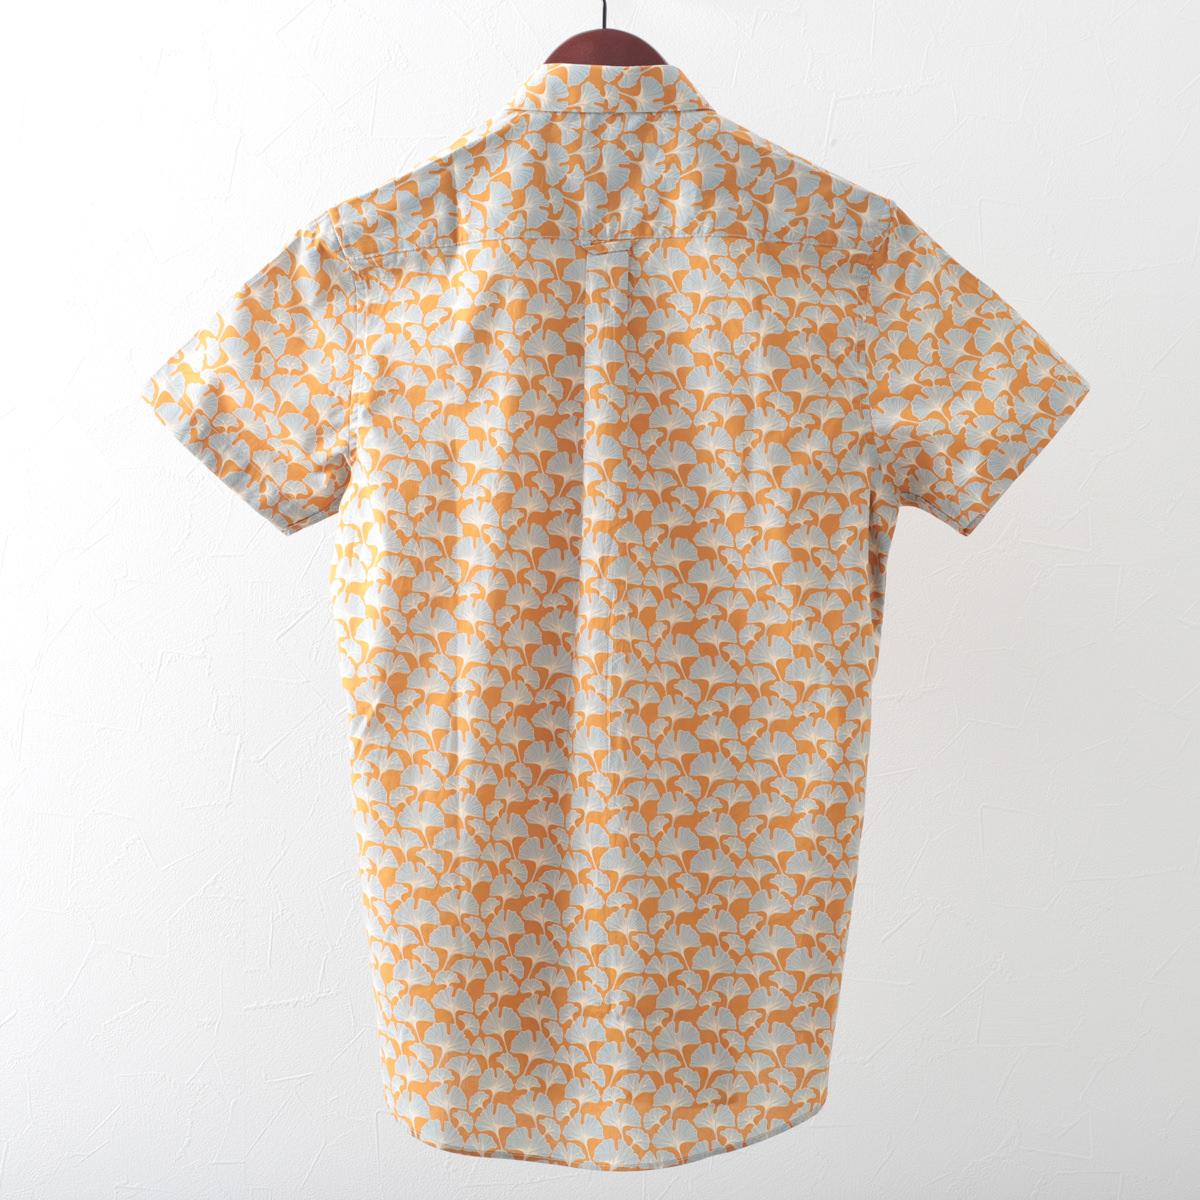 Gabicci メンズ 半袖シャツ イチョウ ガビッチ フレア レトロ モッズファッション